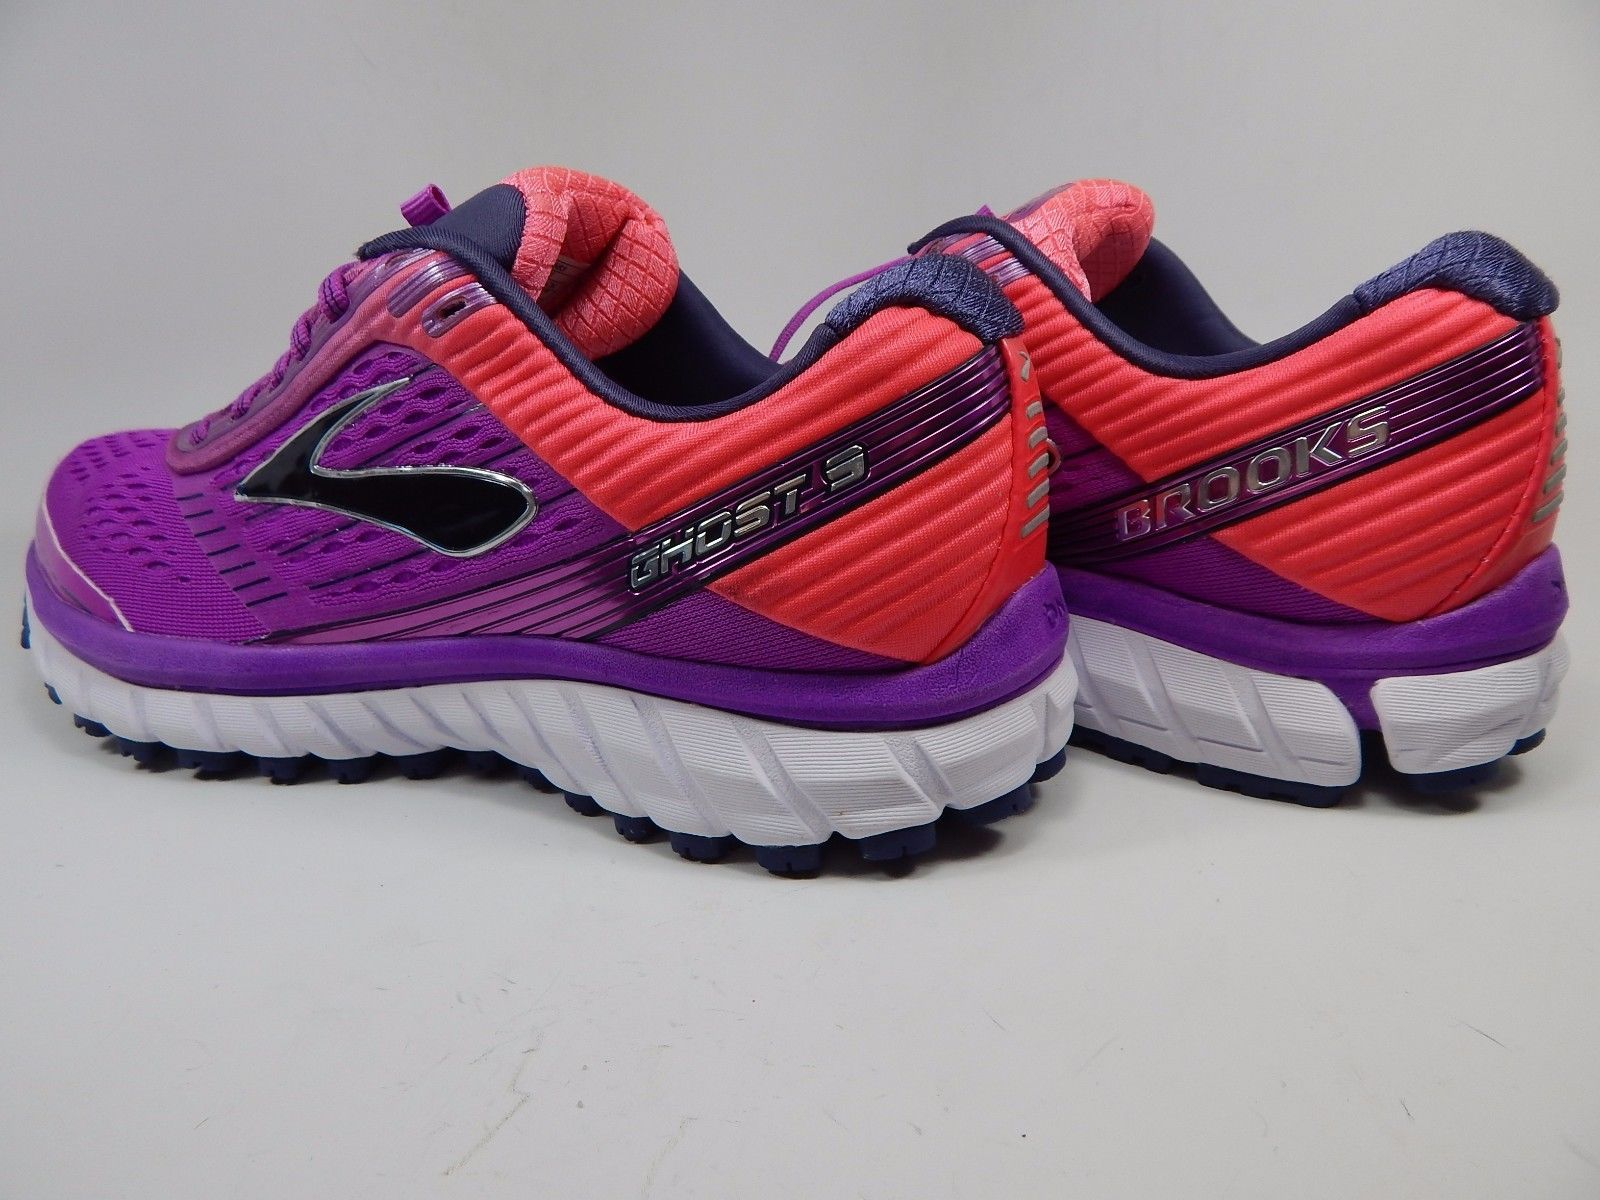 64eab13e335 Brooks Ghost 9 Women s Running Shoes Size US 10 M (B) EU 42 Purple